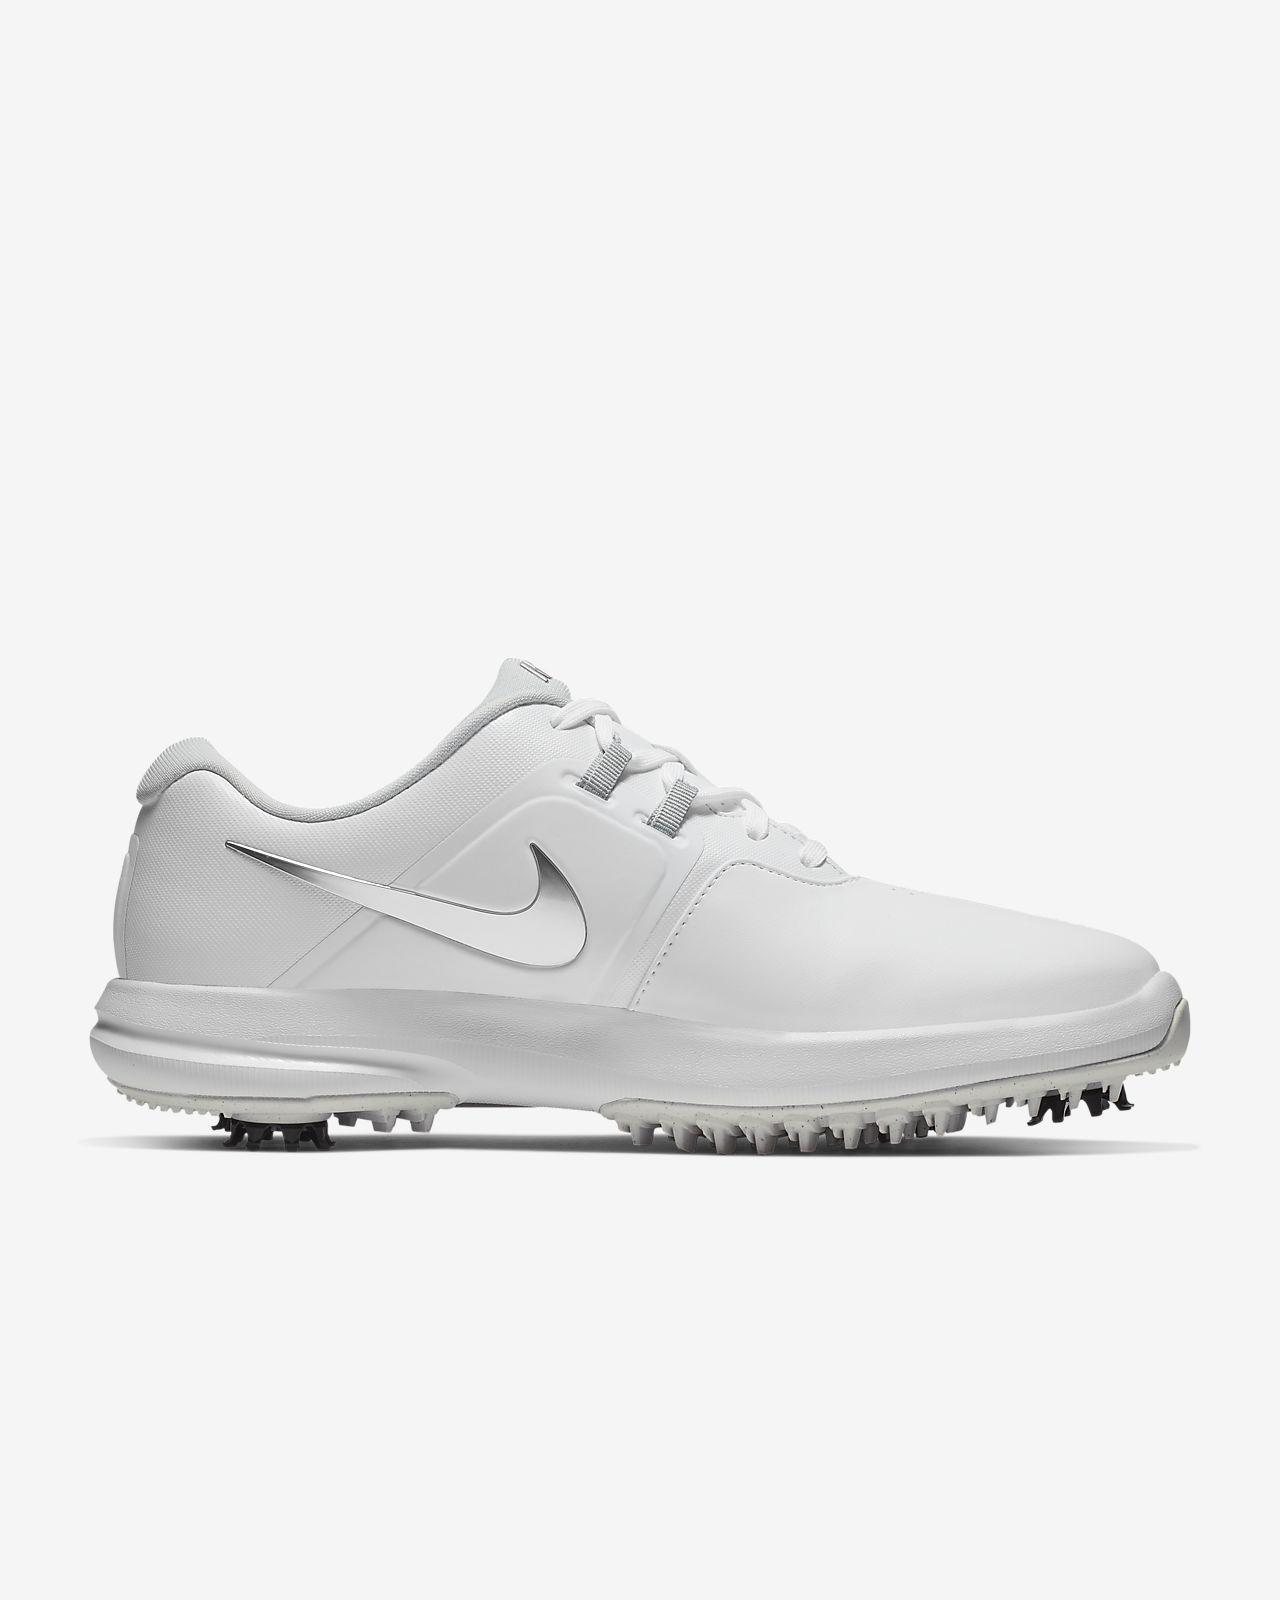 6ae0921d4 Nike Air Zoom Victory Women s Golf Shoe. Nike.com